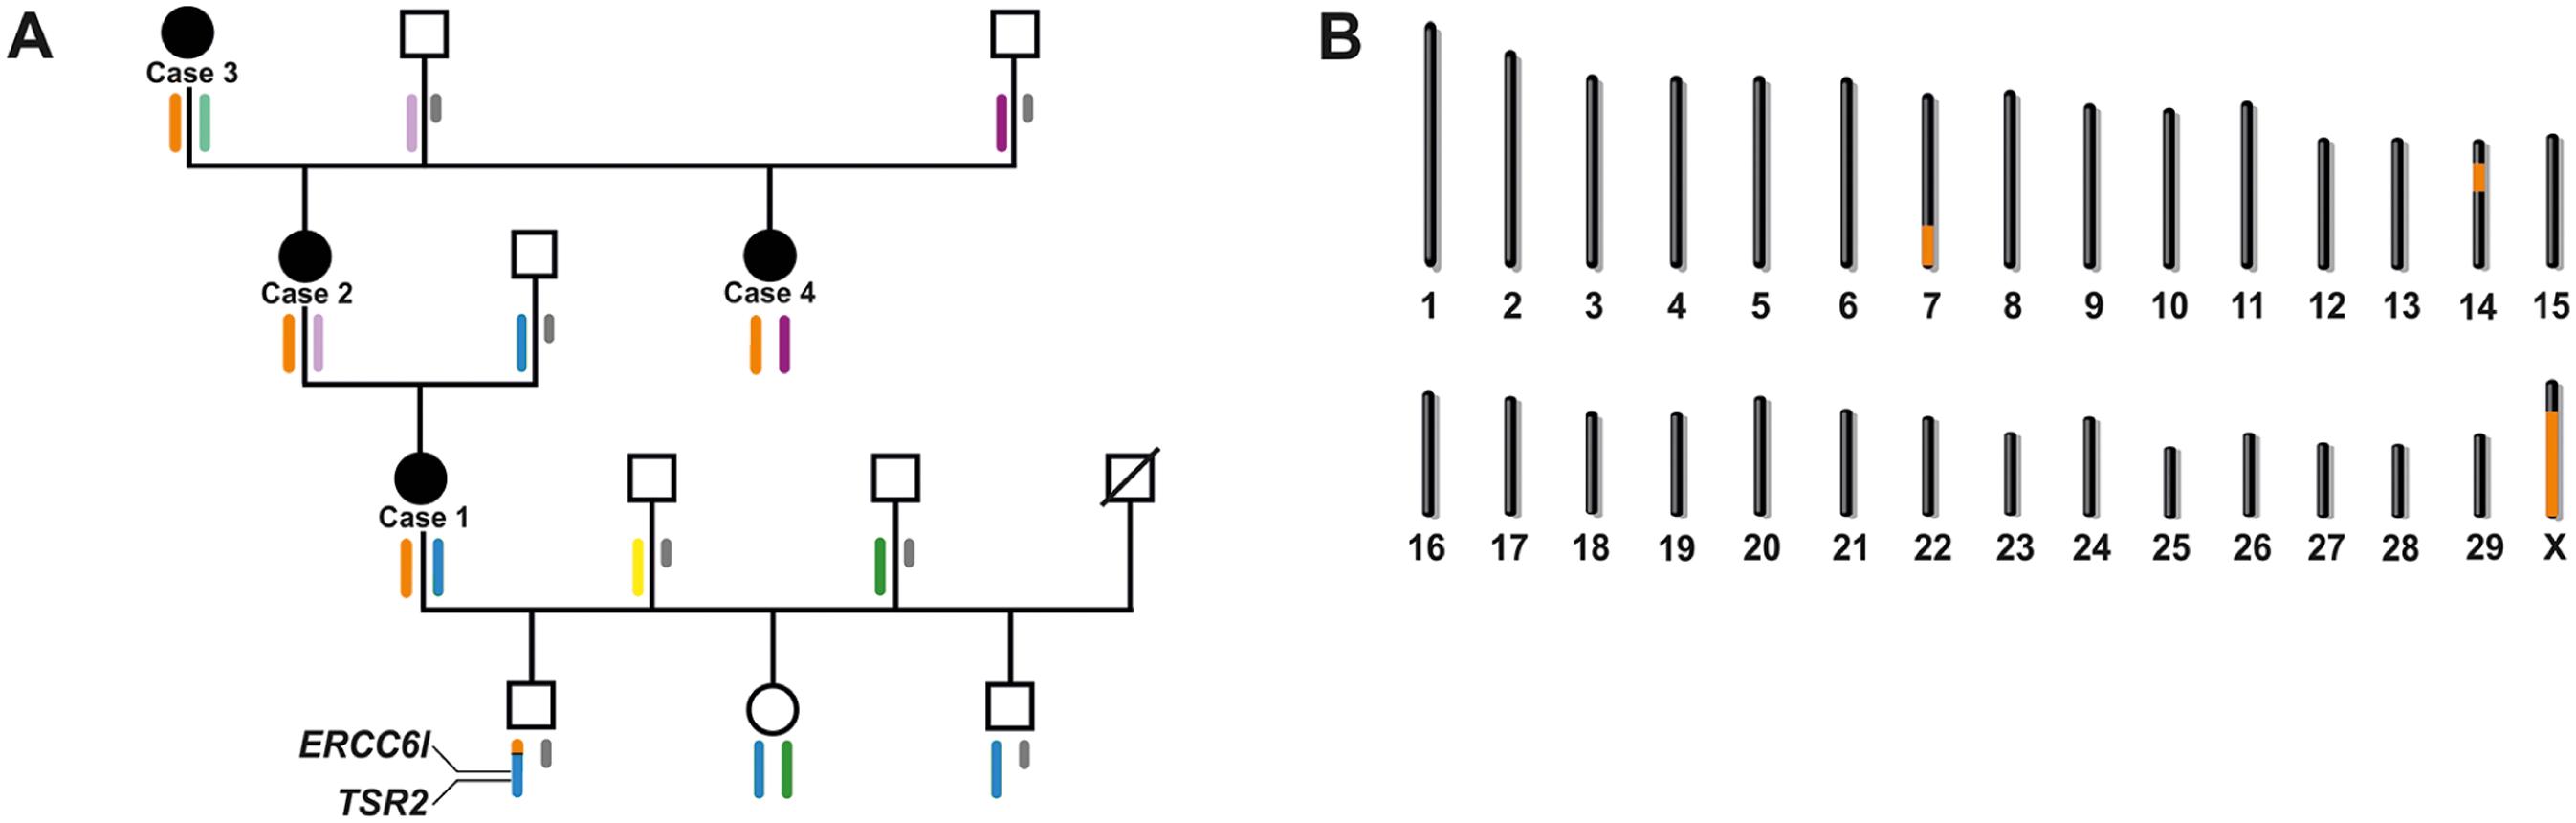 X-linked inheritance of bovine streaked hairlessness.